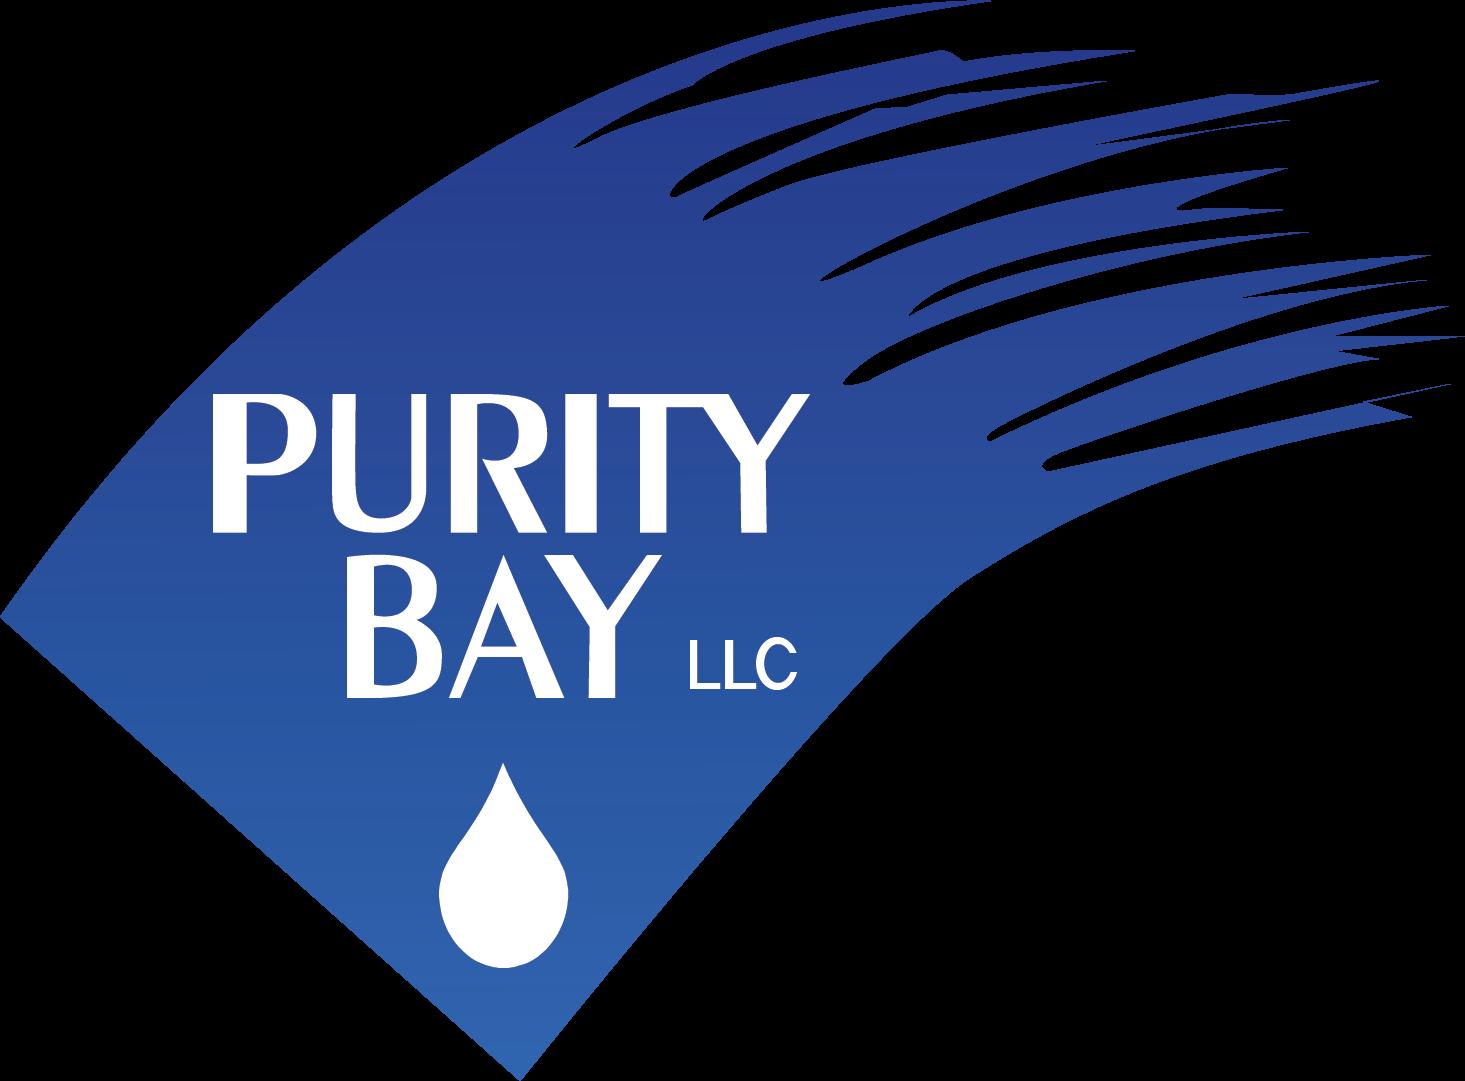 Purity Bay